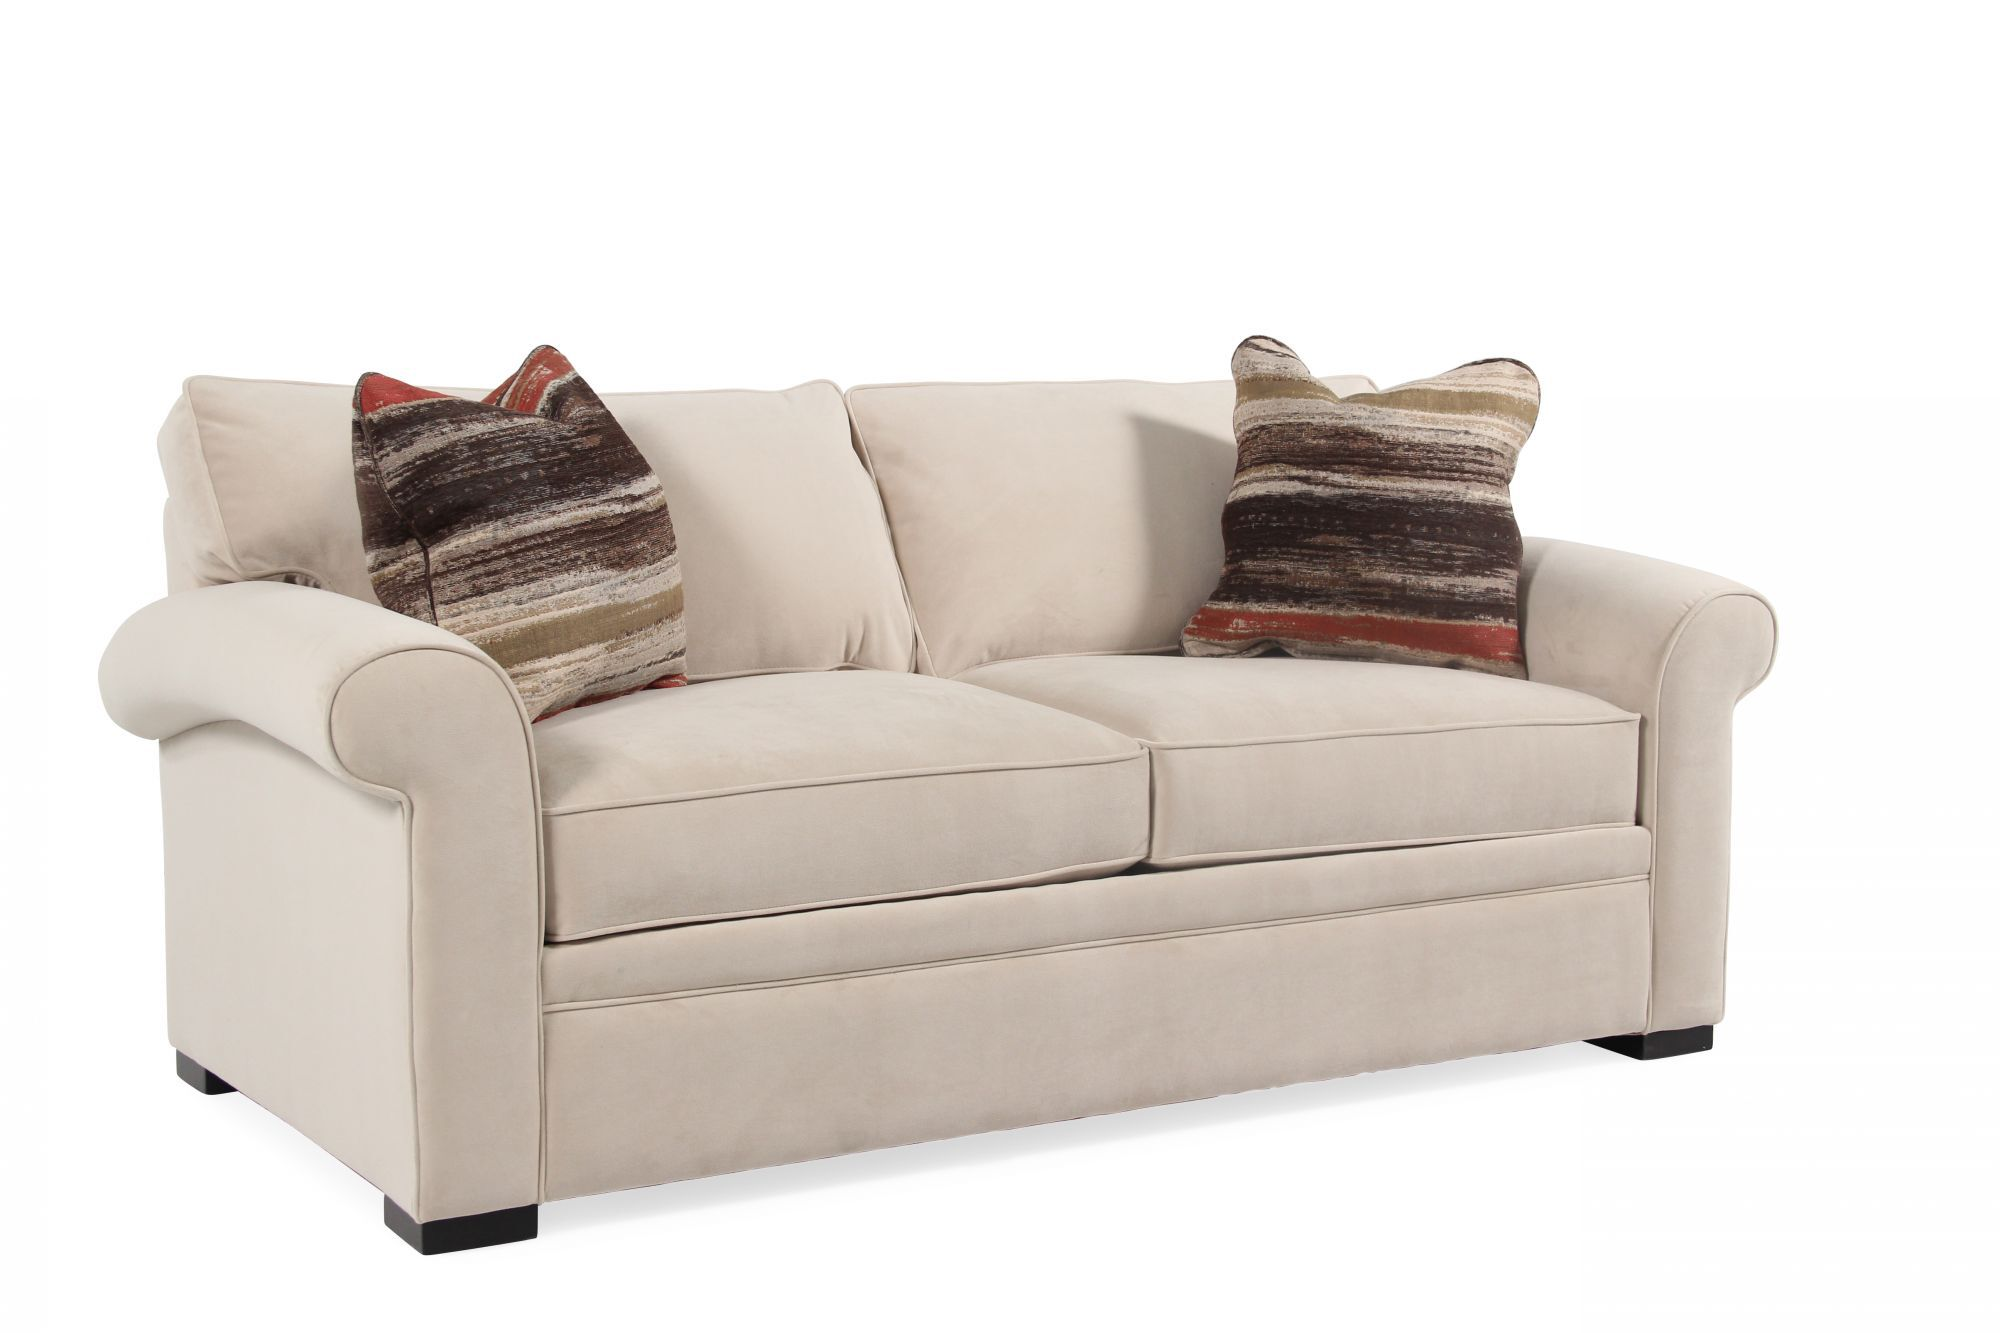 Cream Rolled Arm Transitional 38 Sleeper Sofa